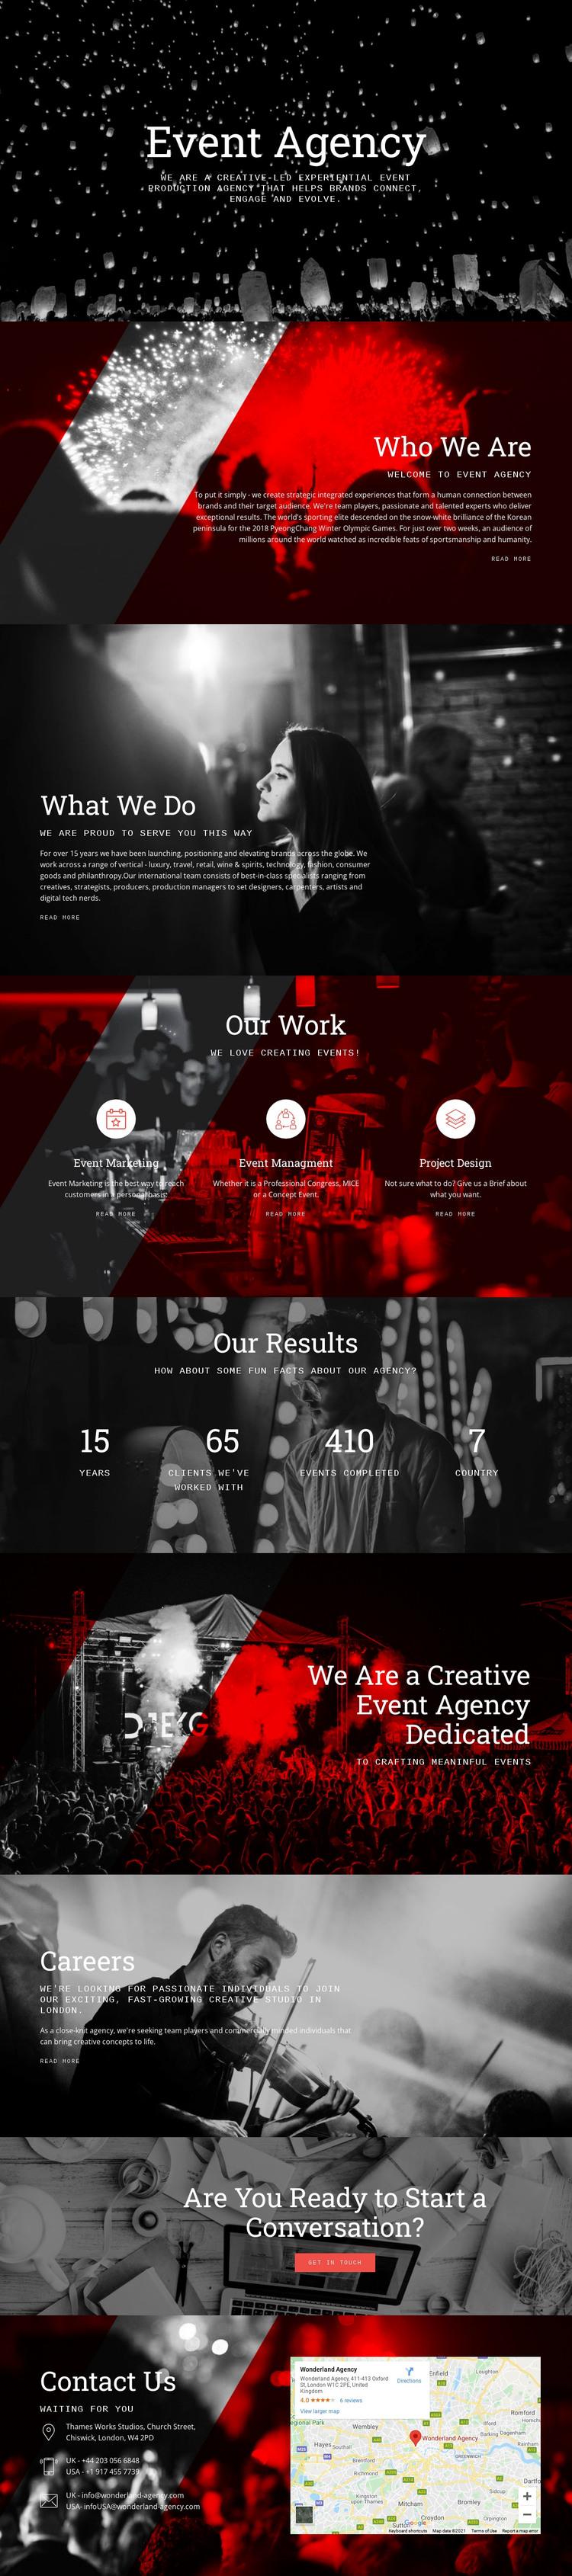 Event Agency Web Design